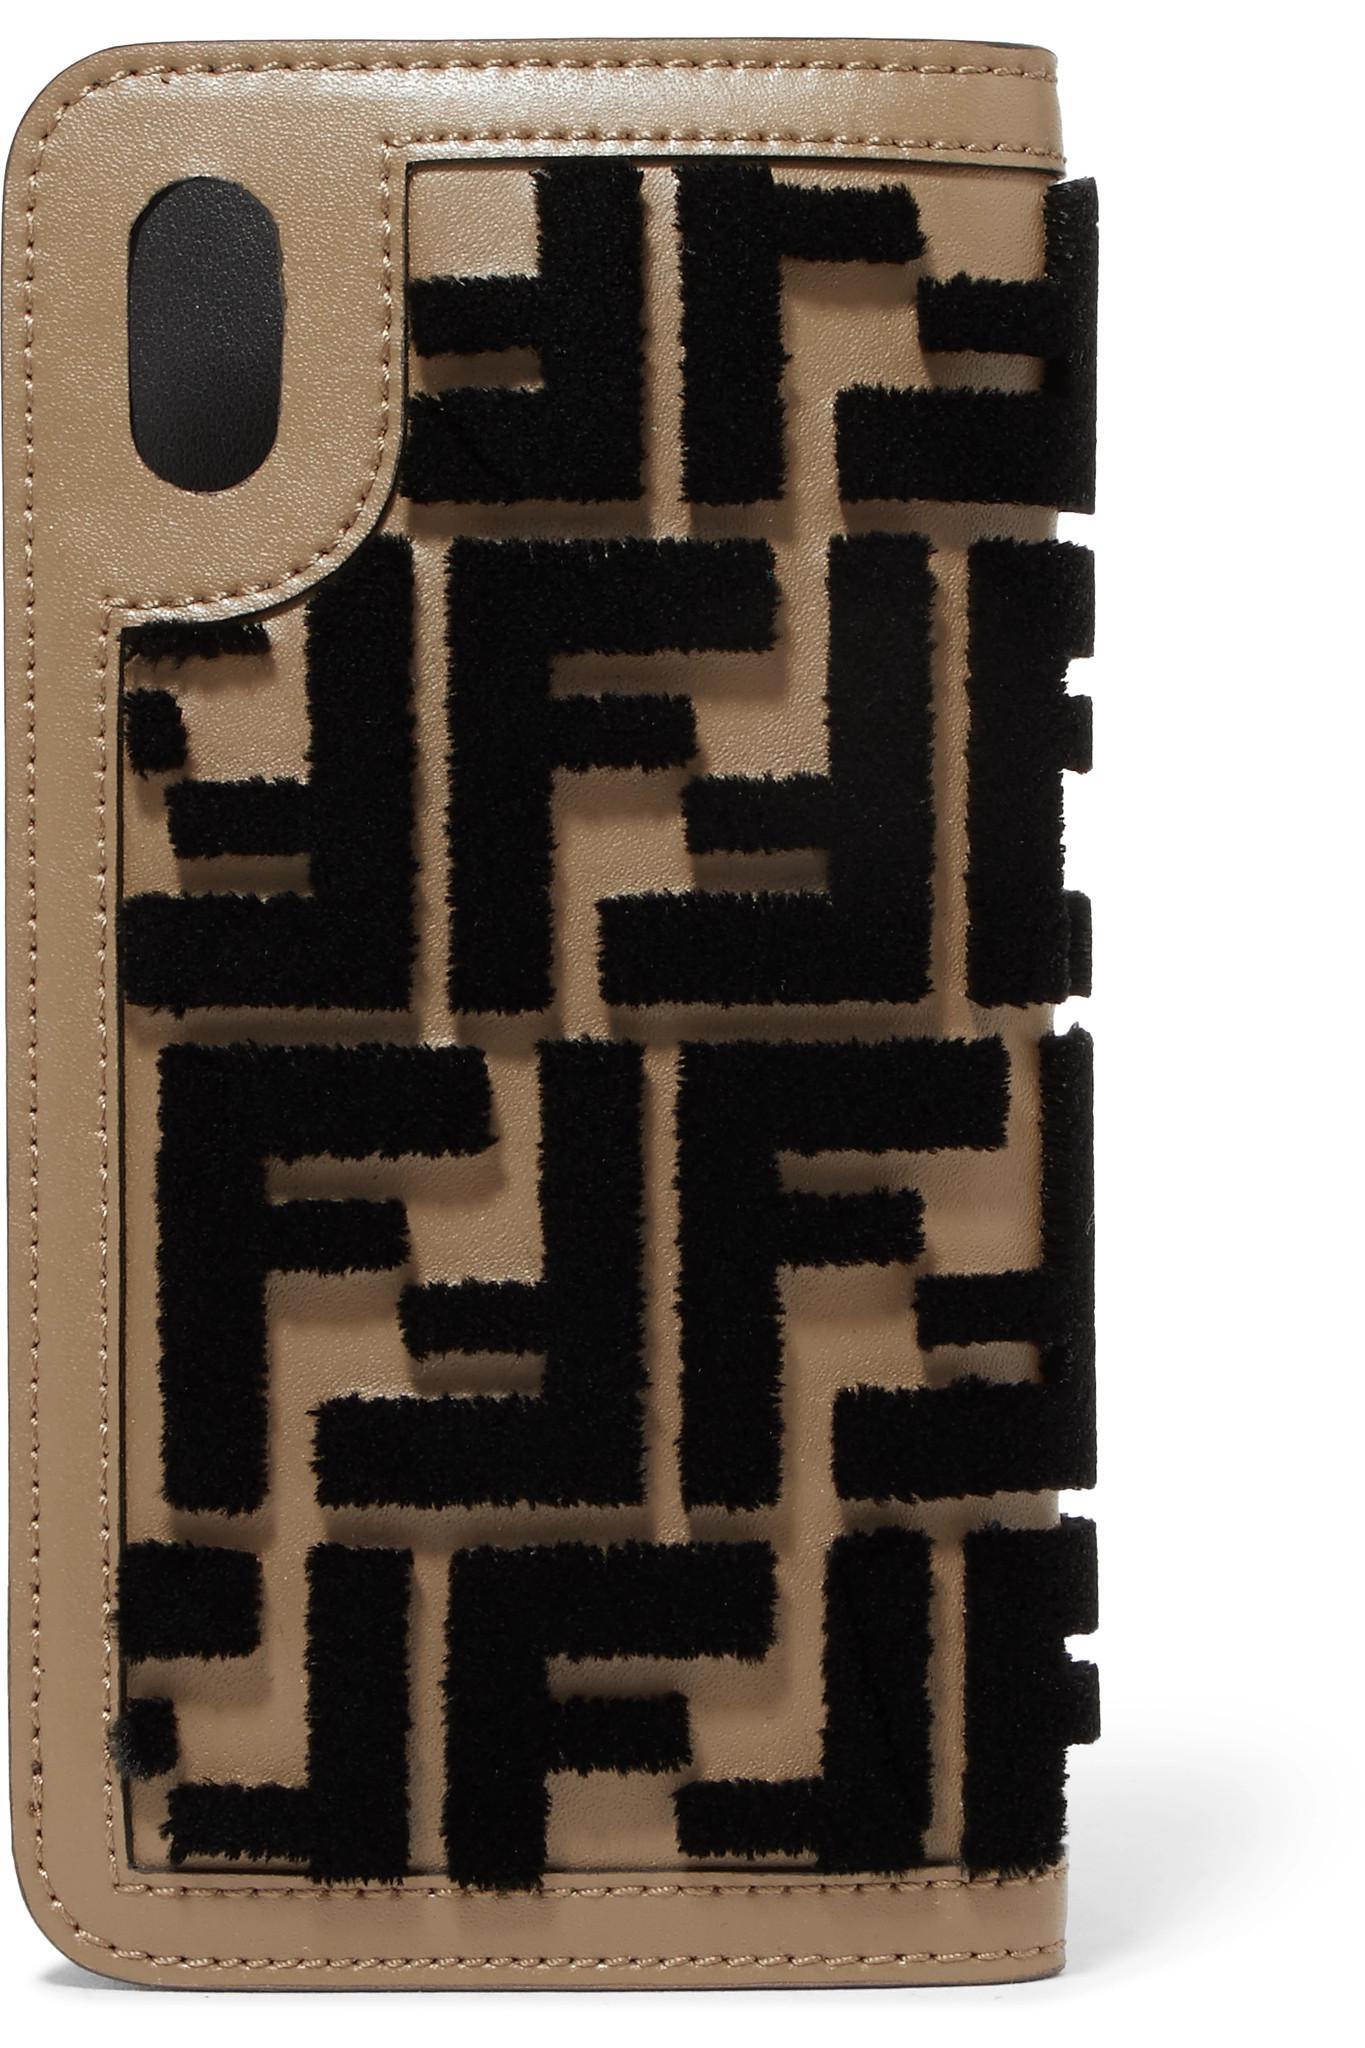 03cb81668230 funda con Lyst Iphone X Brown cuero de flocado para Fendi wTxZ1I5qZ